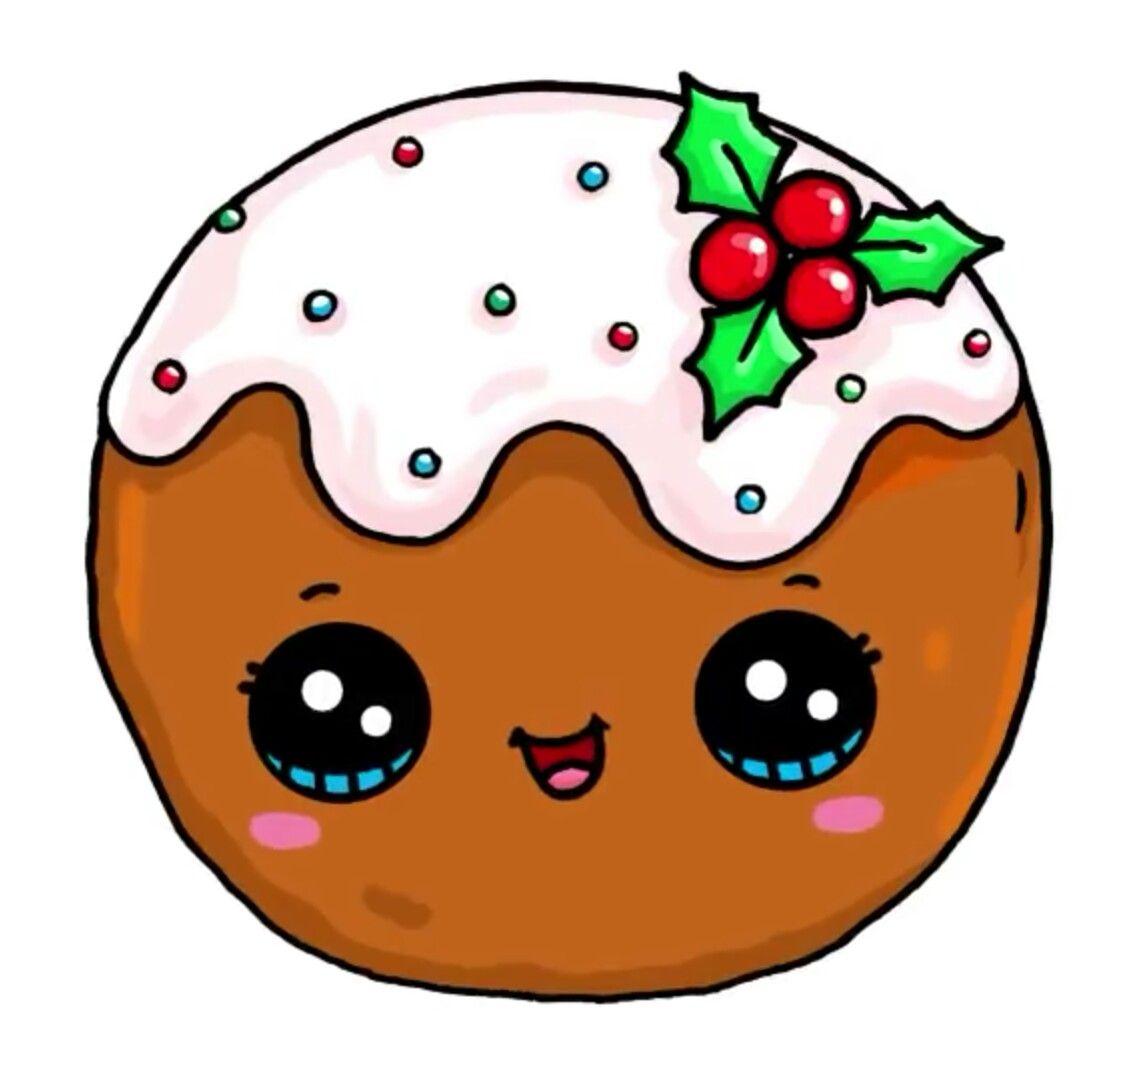 Kerst Tekeningen Schattige Plaatjes In 2019 Pinterest Cute